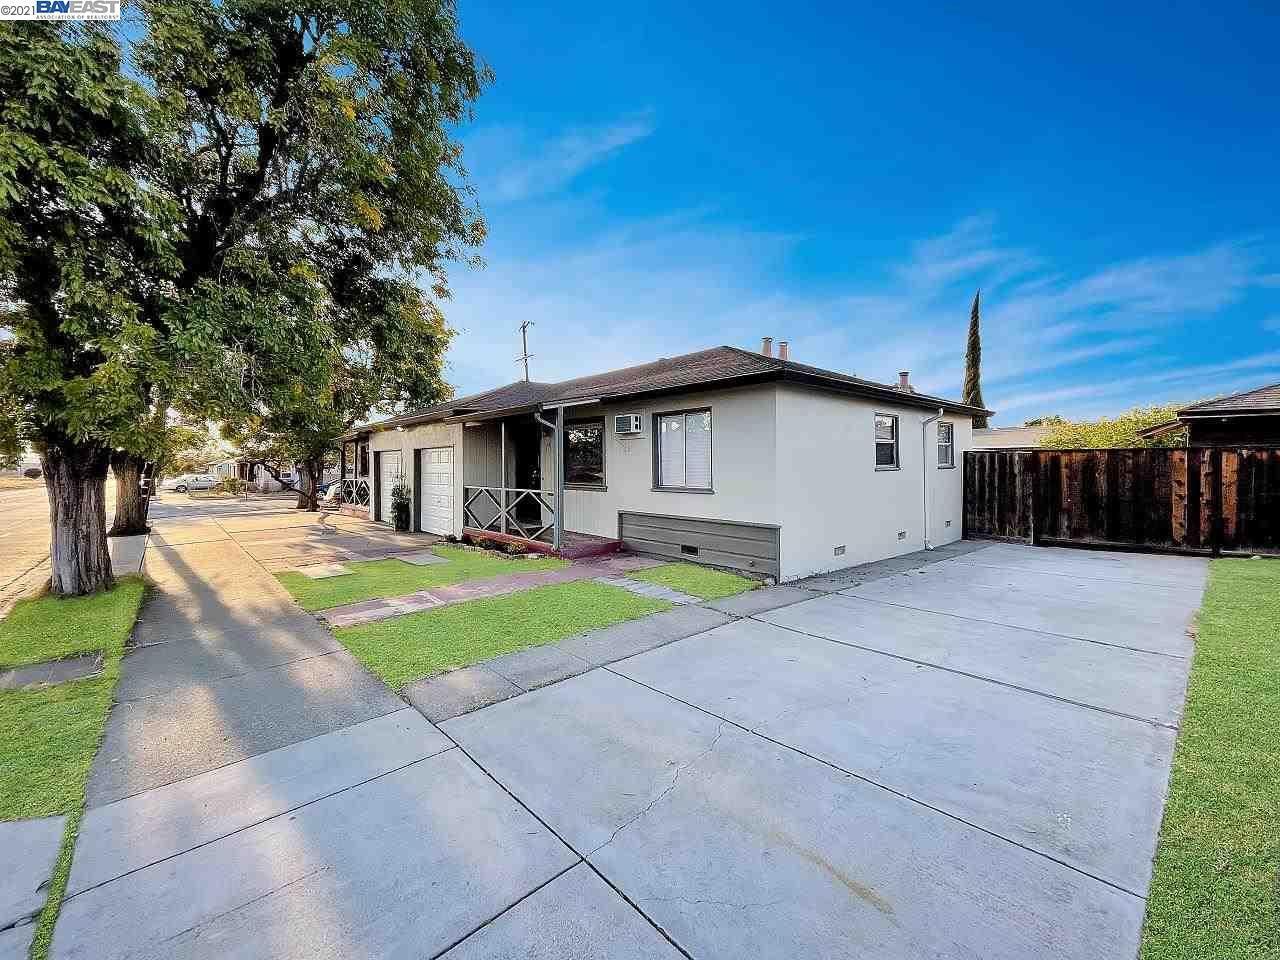 Photo of 296 Power Ave, PITTSBURG, CA 94565 (MLS # 40961638)